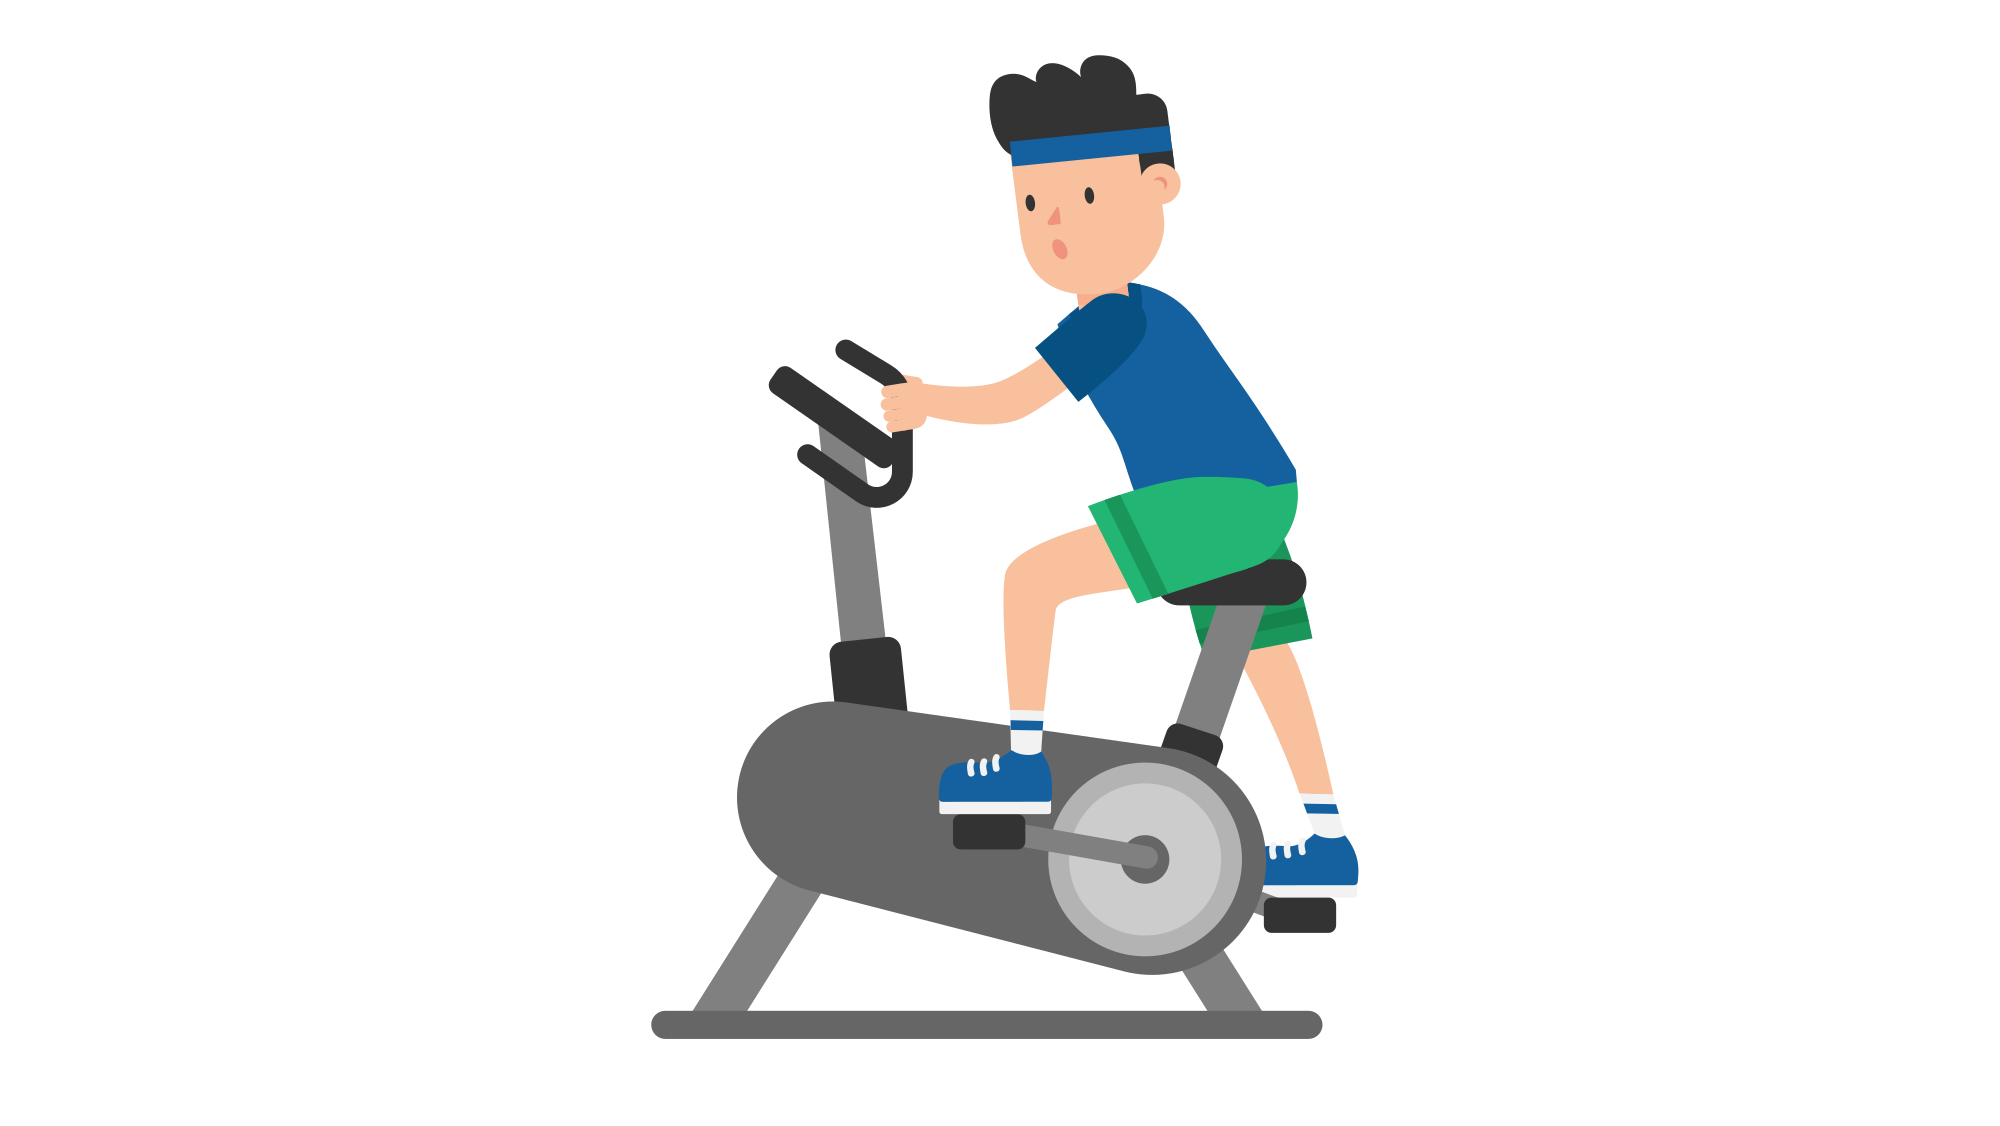 Exercise cartoon images secondtofirst. Exercising clipart stationary bike